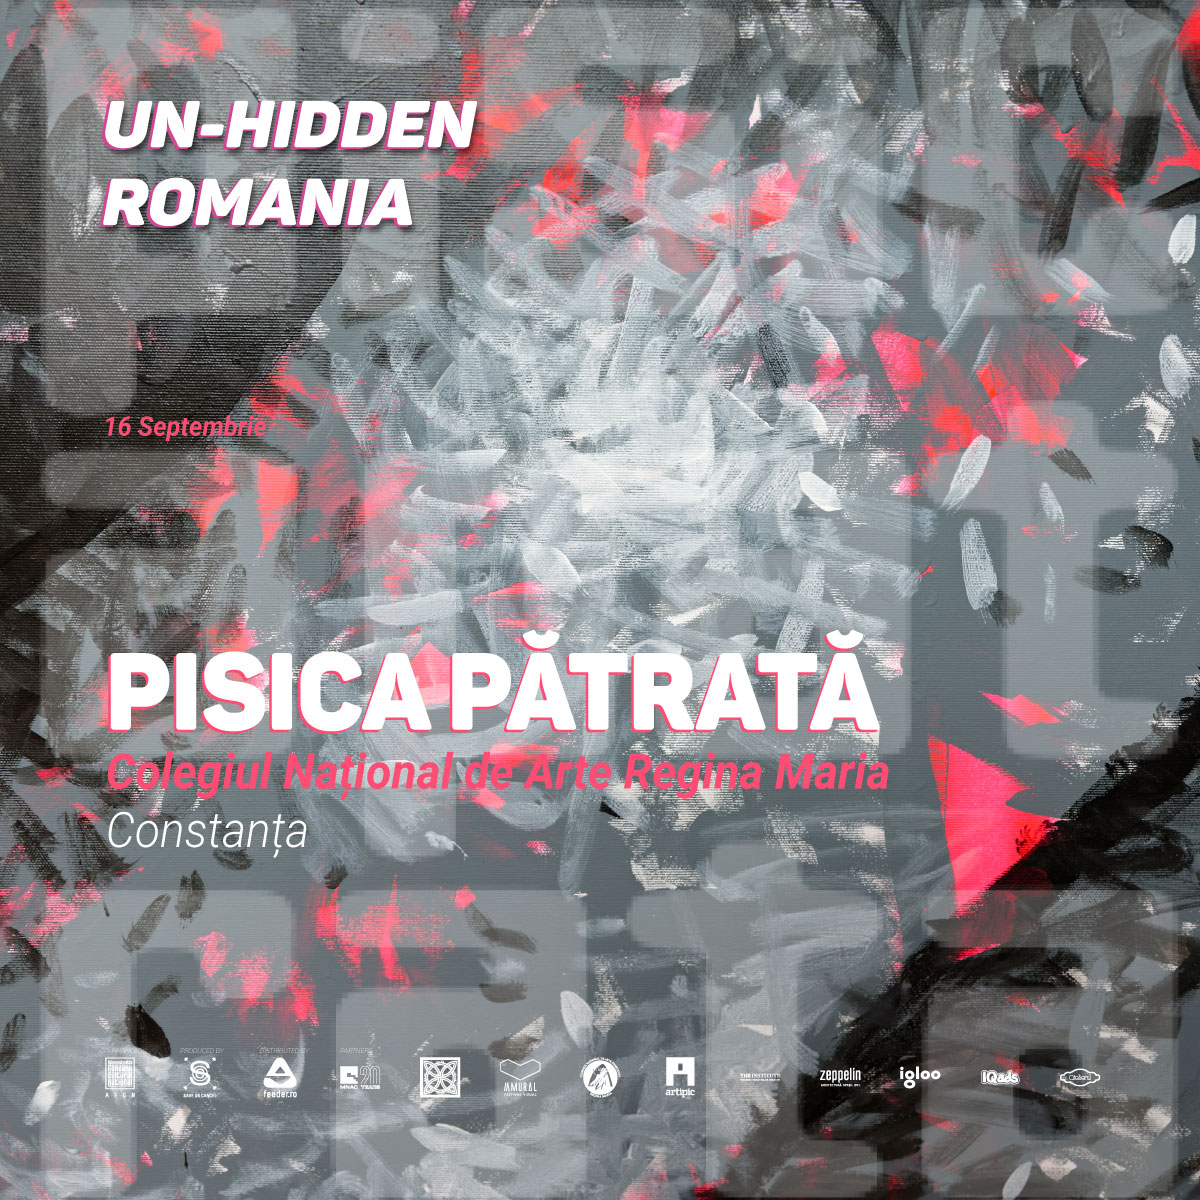 Un-hidden Romania invites Pisica Pătrată to paint in Constanta